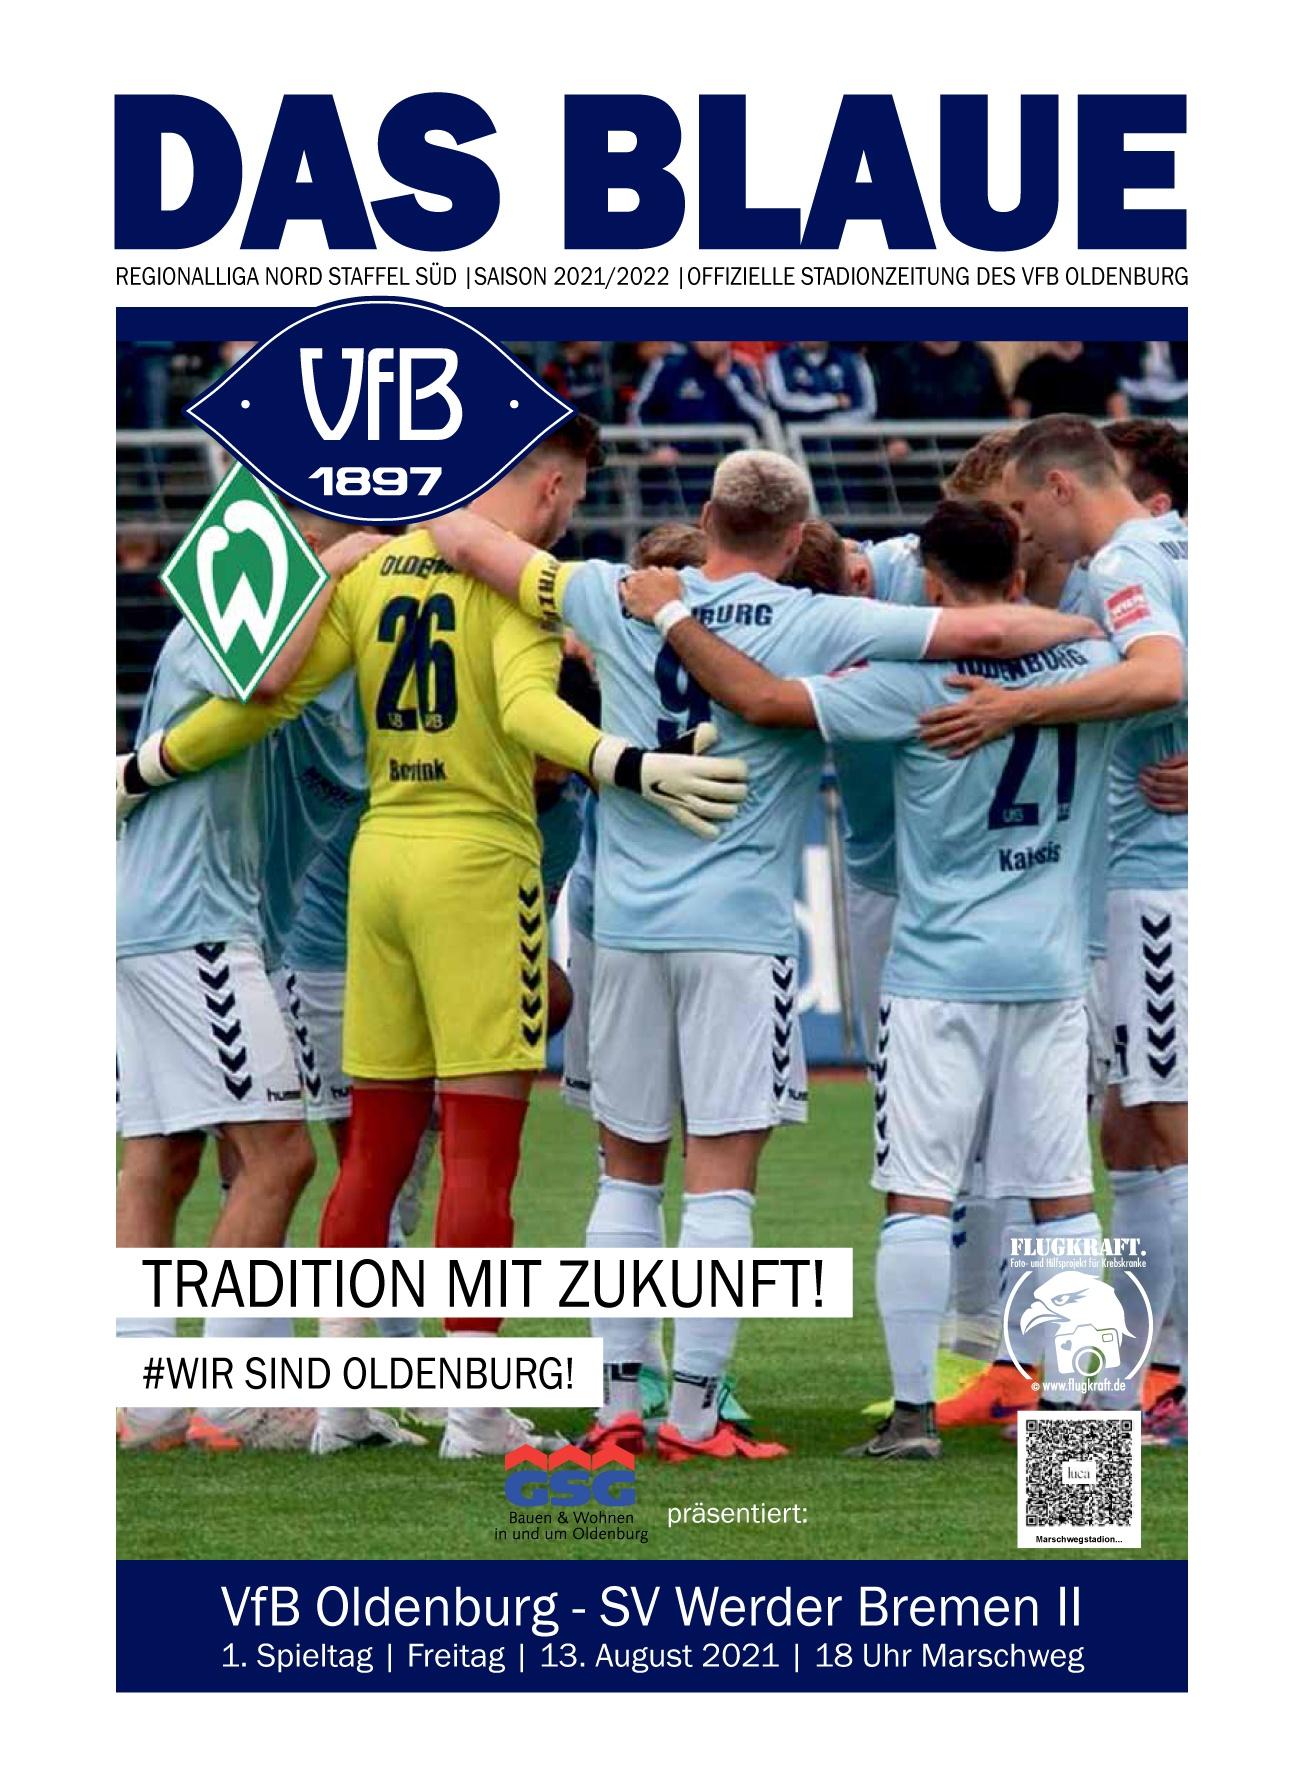 https://vfb-oldenburg.de/wp-content/uploads/2021/08/VFB_Oldenburg_1_Spieltag_2021_2022.jpg